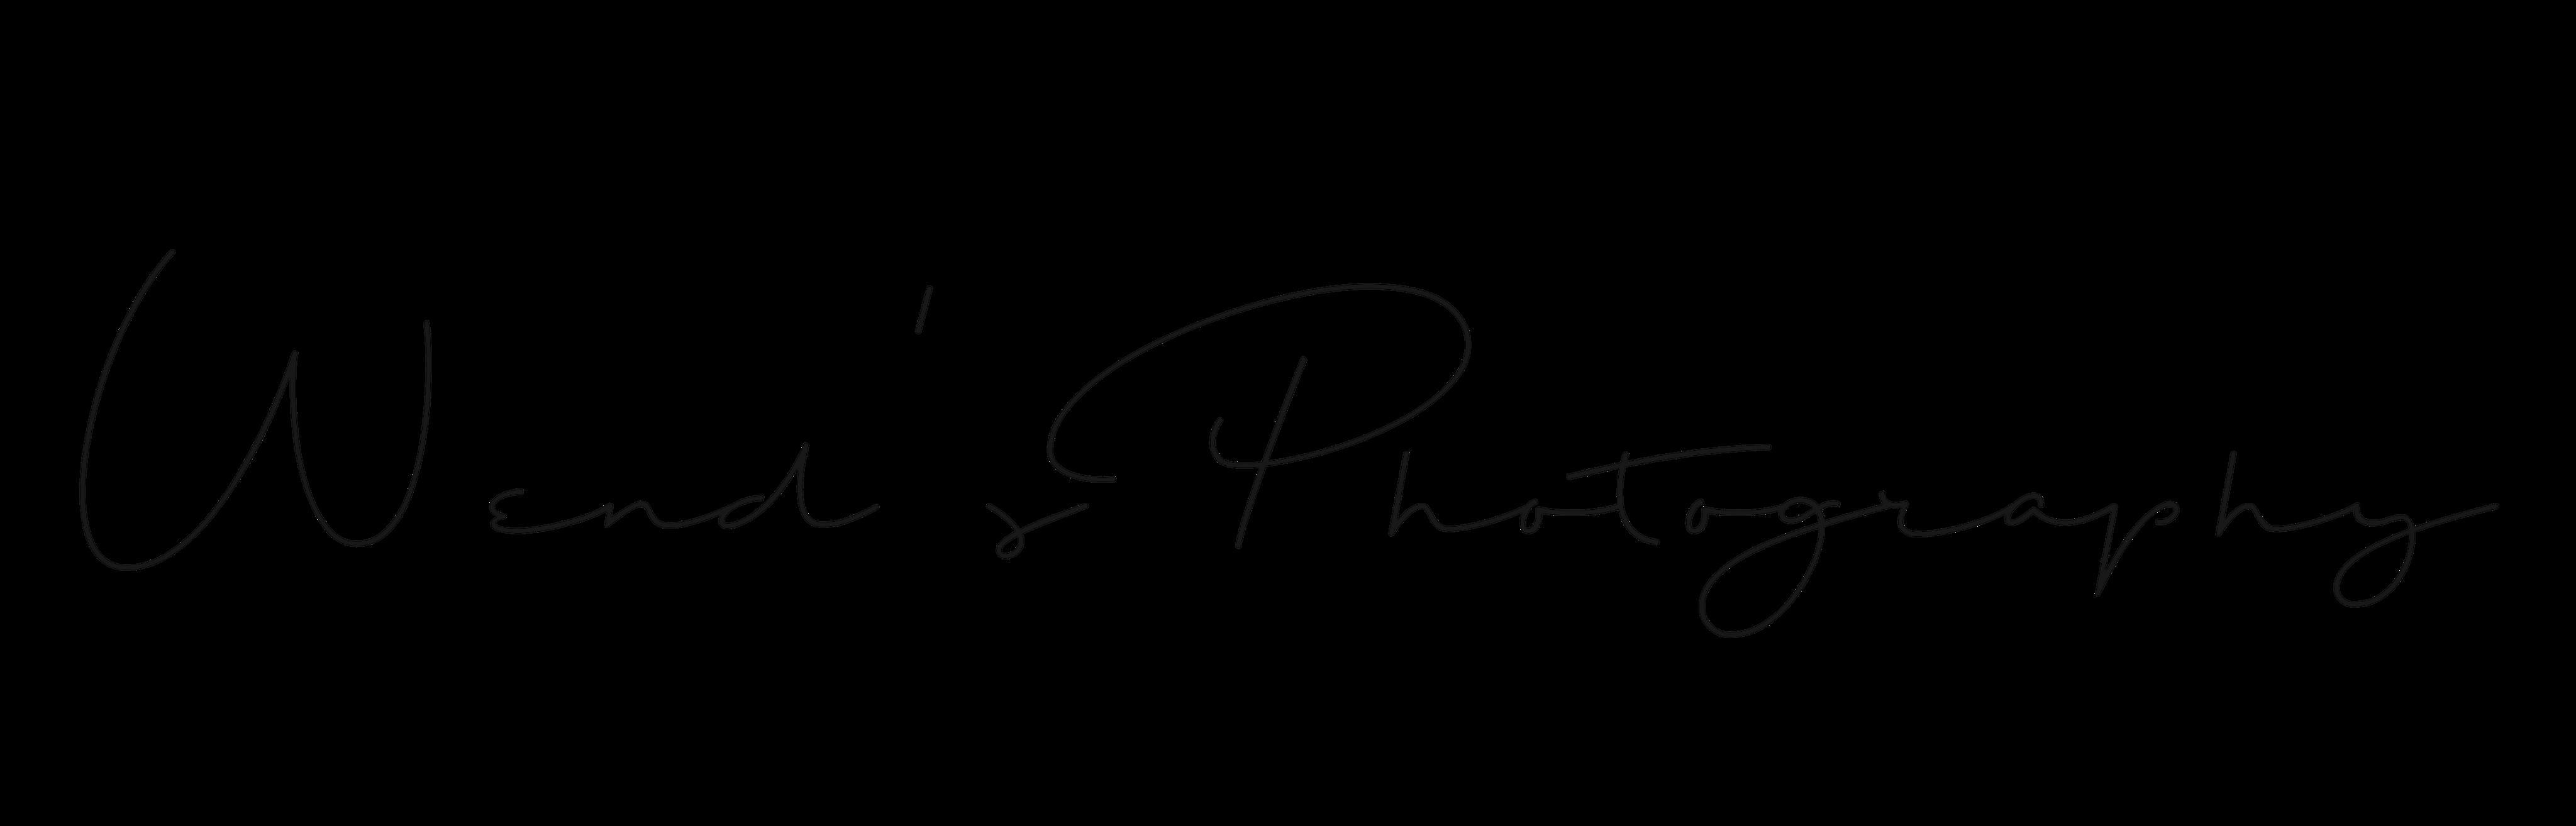 Wendy McDonnell website logo